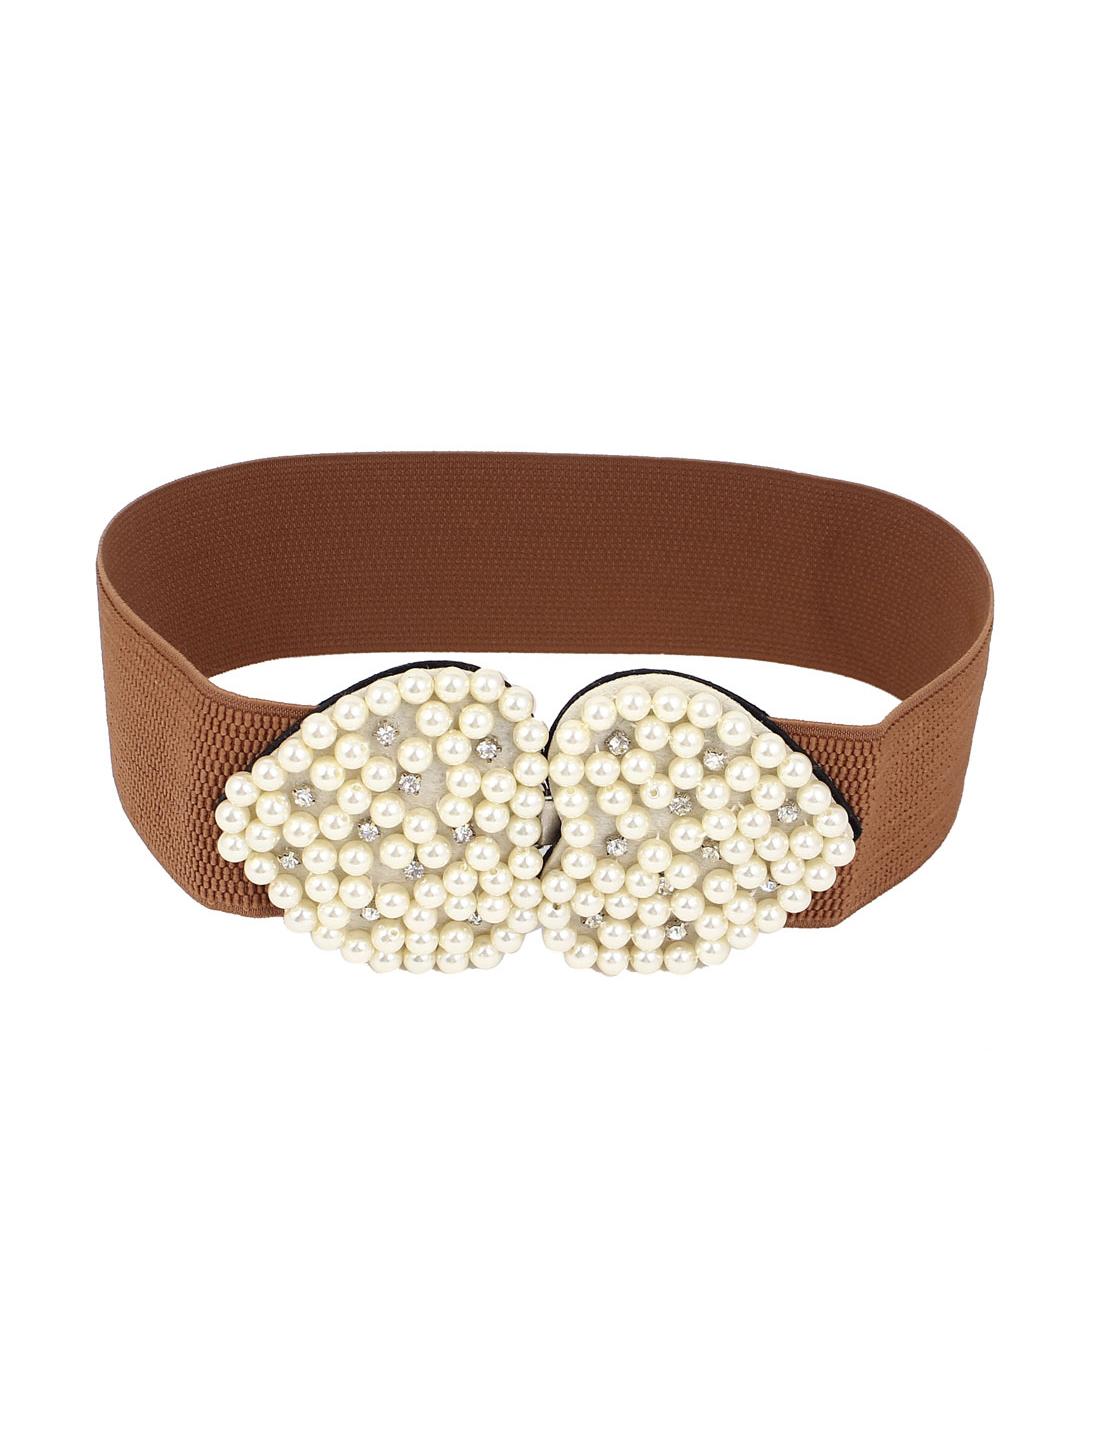 Women Faux Pearl Decor Dual Heart Design Interlocking Buckle Elastic Cinch Waist Belt Brown